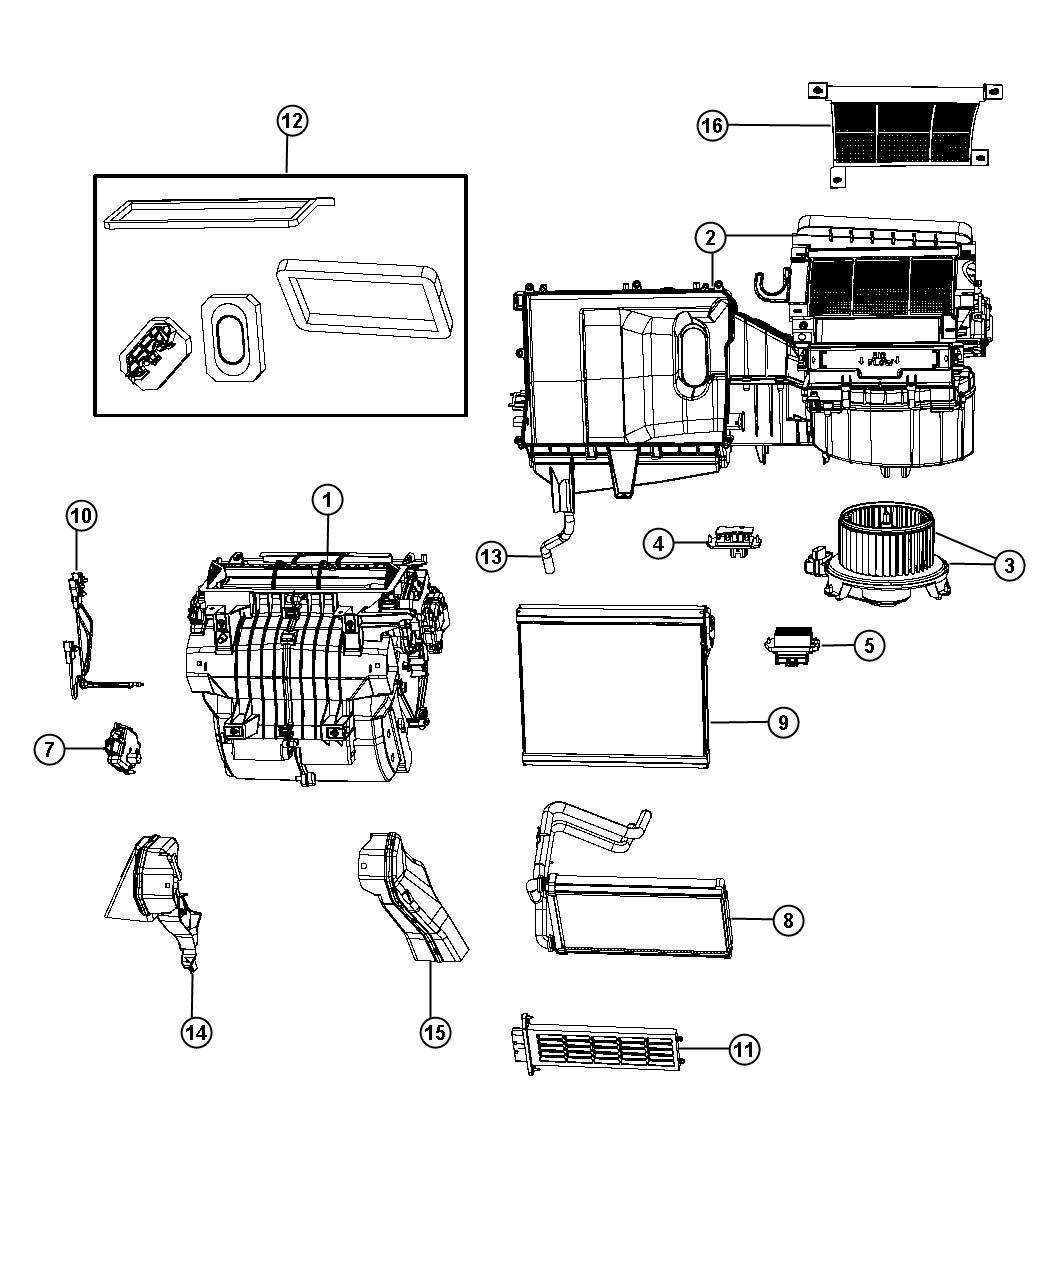 Dodge Avenger Evaporator Air Conditioning Haa